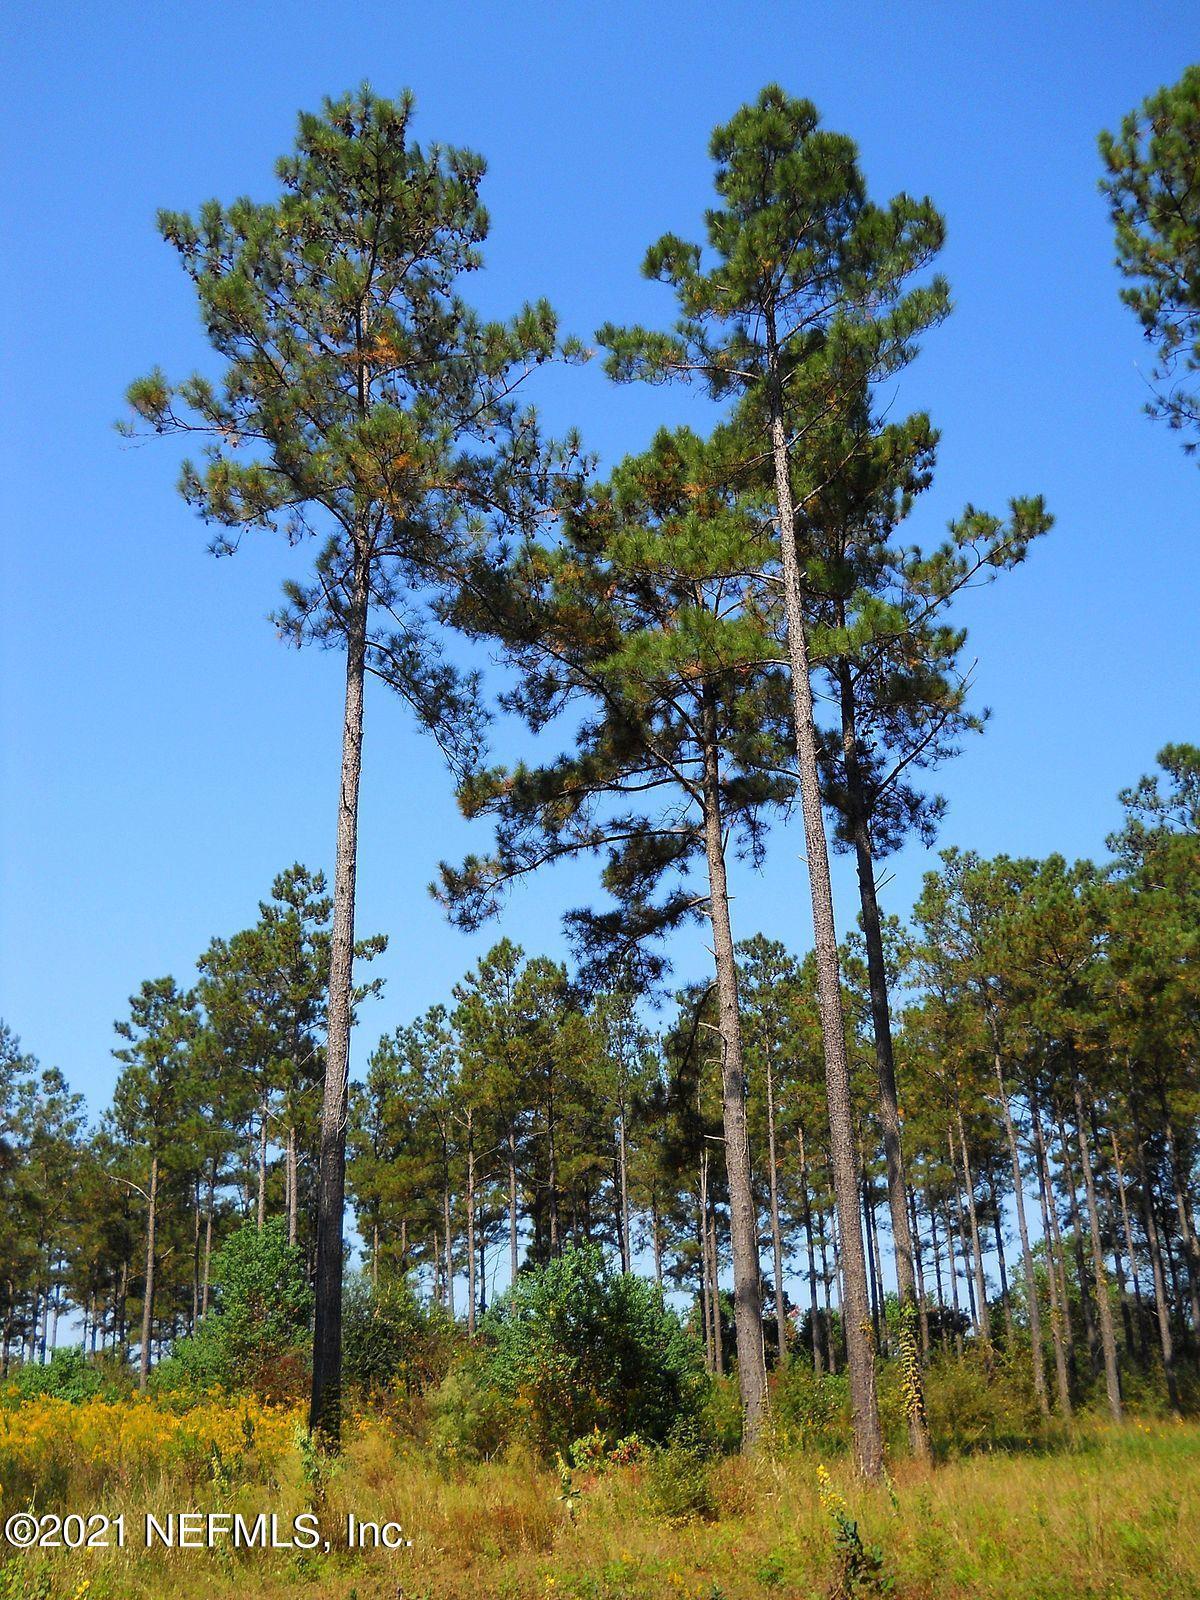 Listing Details for 0 Pecan Park, JACKSONVILLE, FL 32218